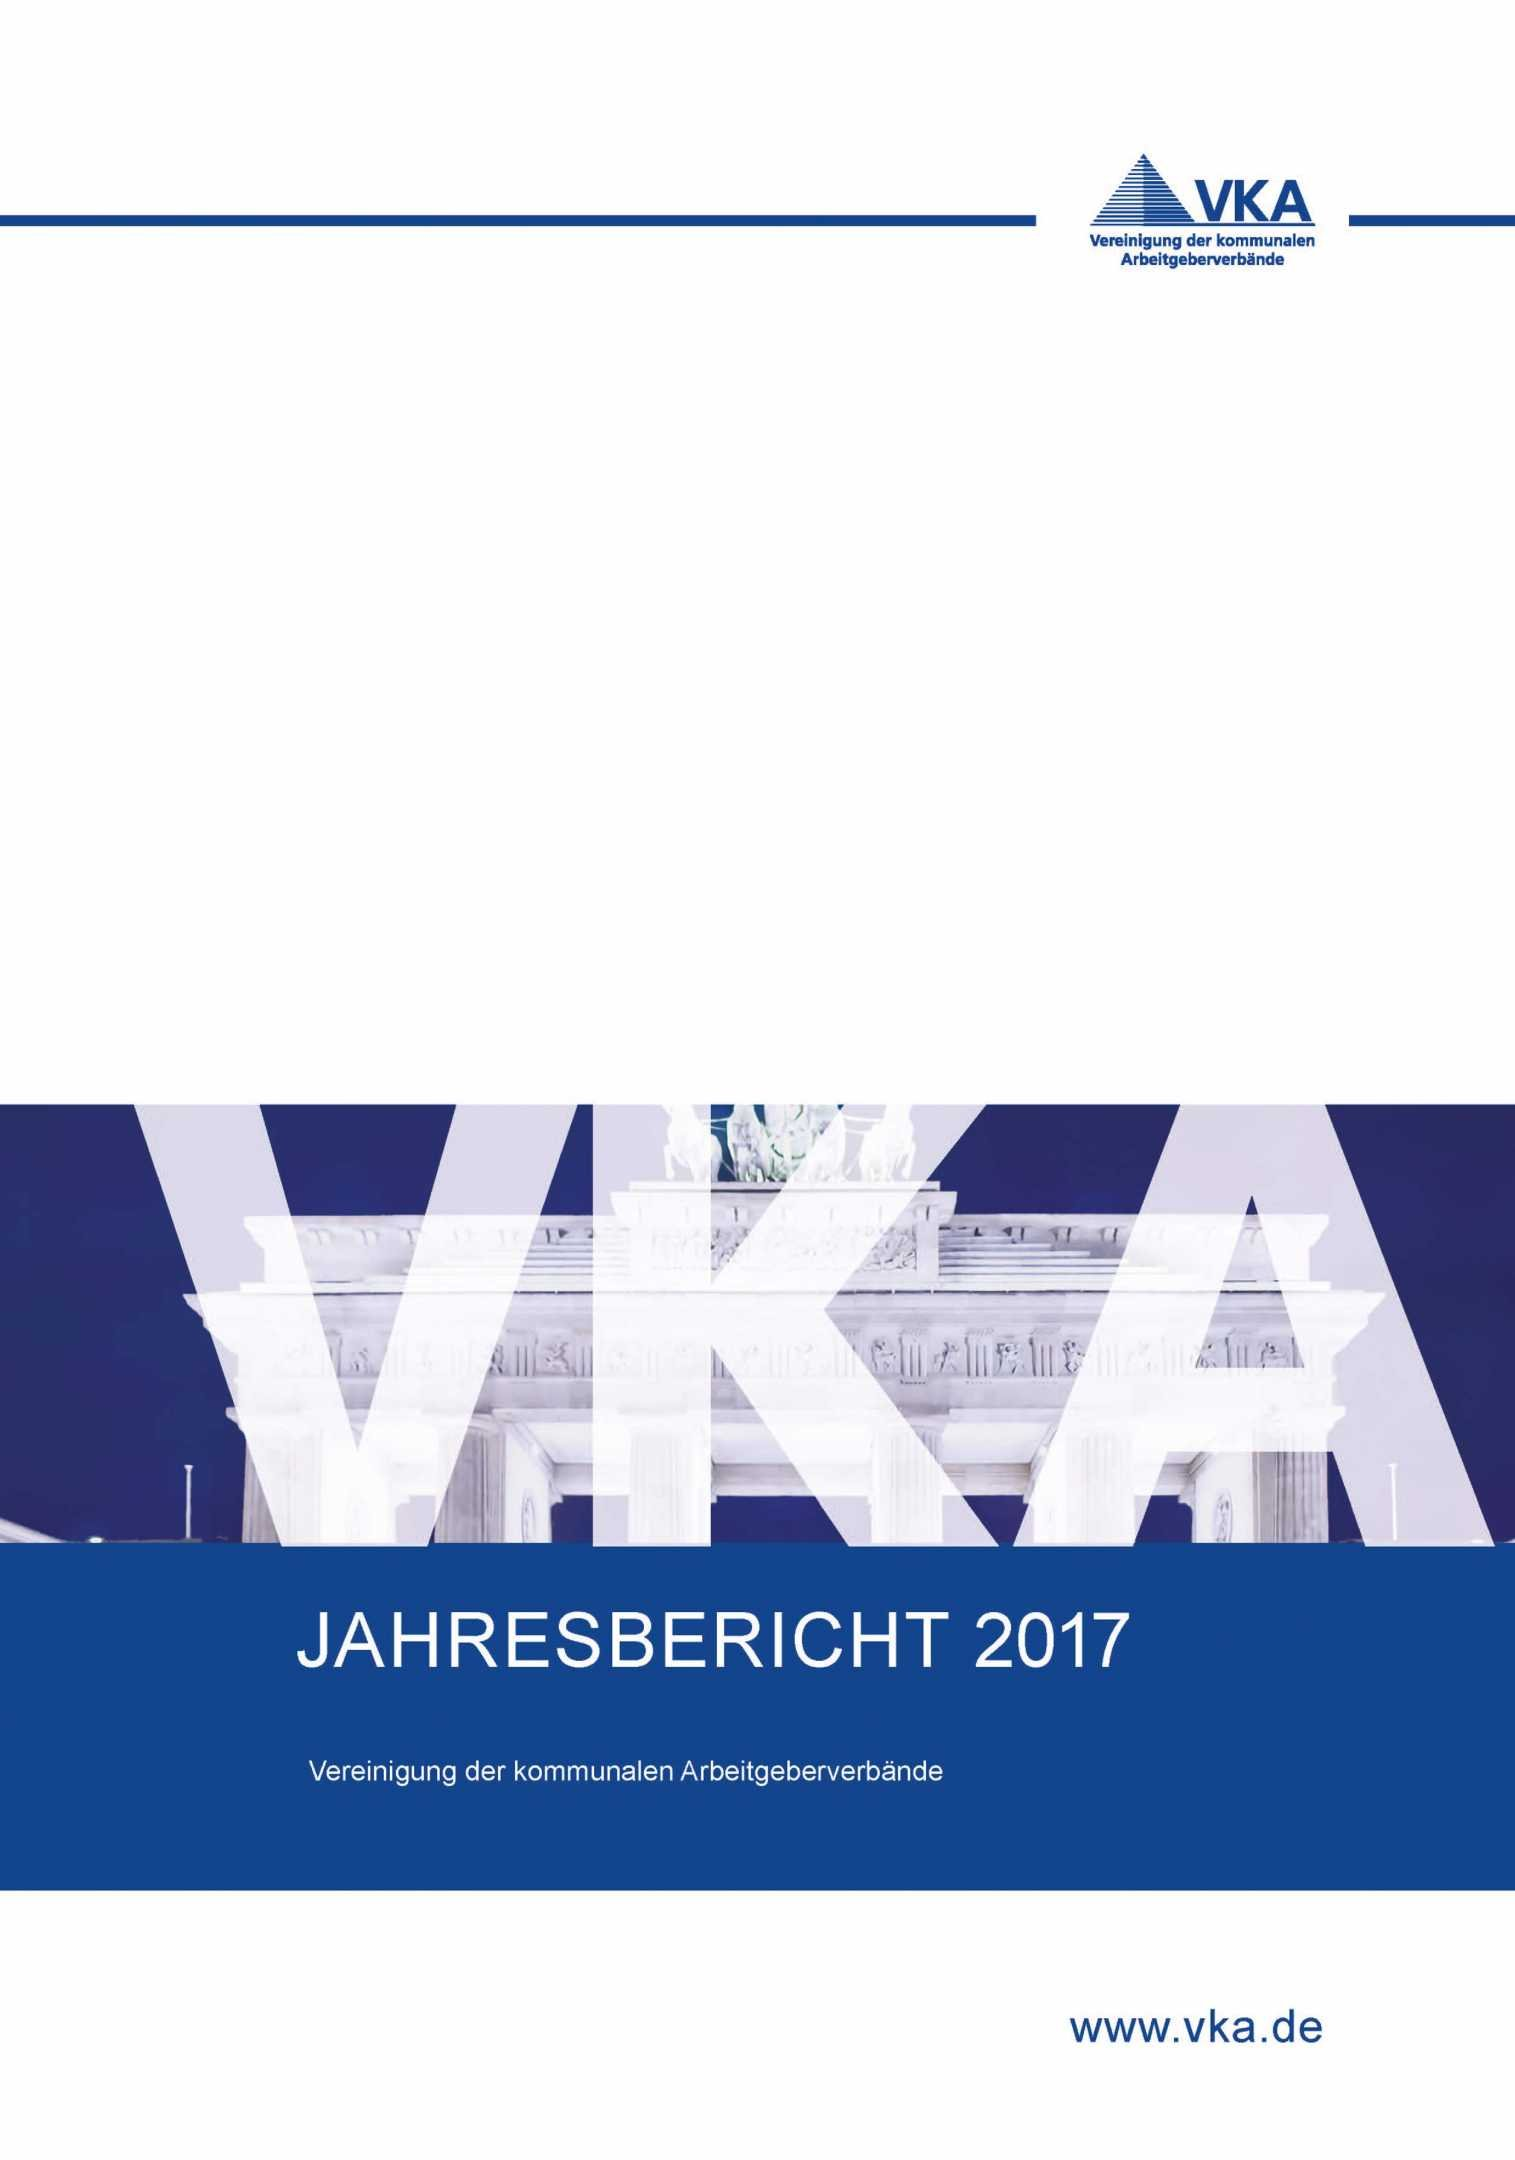 Design Jahresbericht VKA 2017